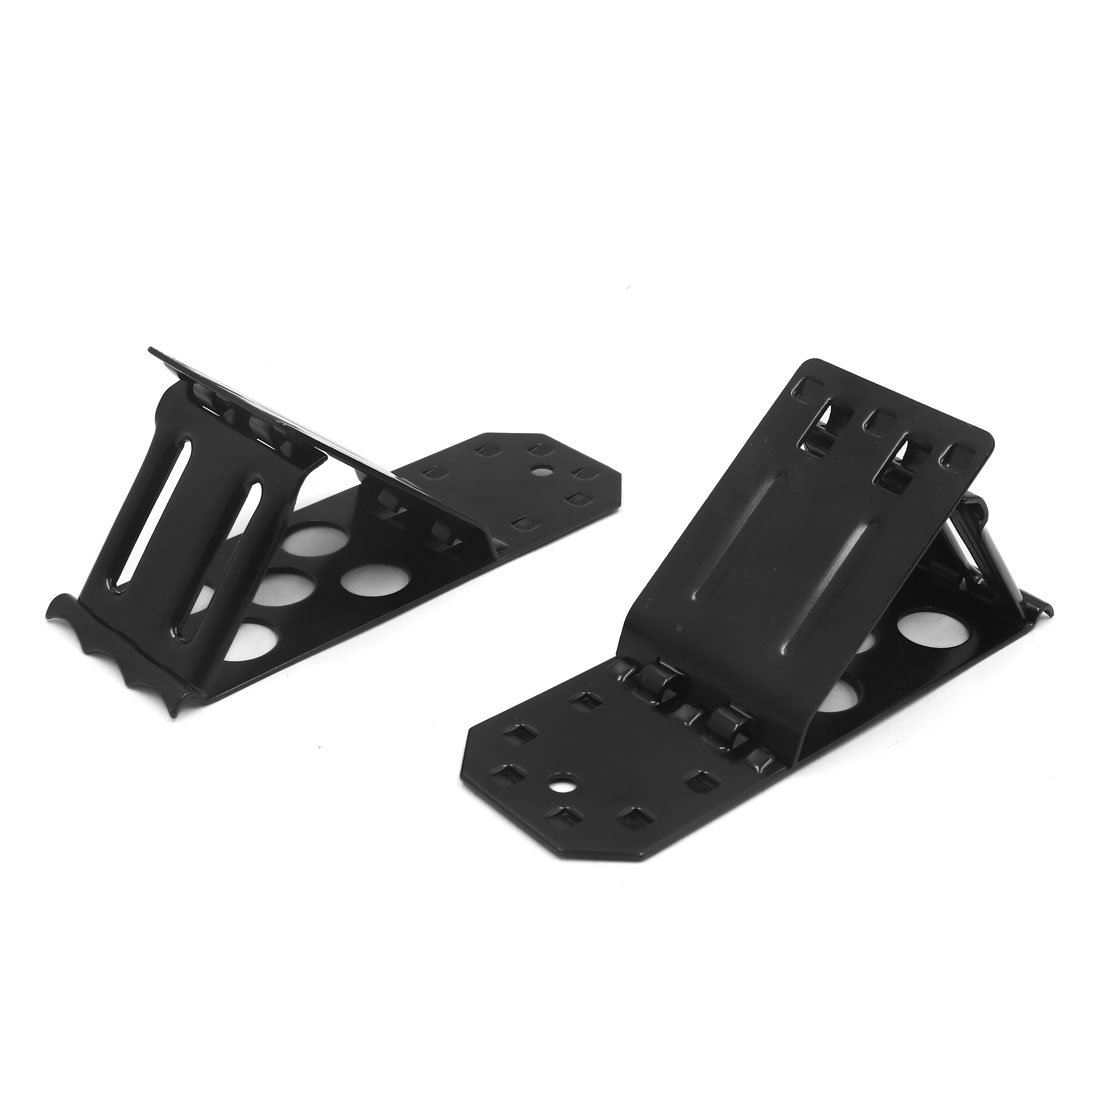 uxcell 2 Pcs Metal Folding Wheel Chock Camper Car Tire Emergency Stop Stopper Blocker